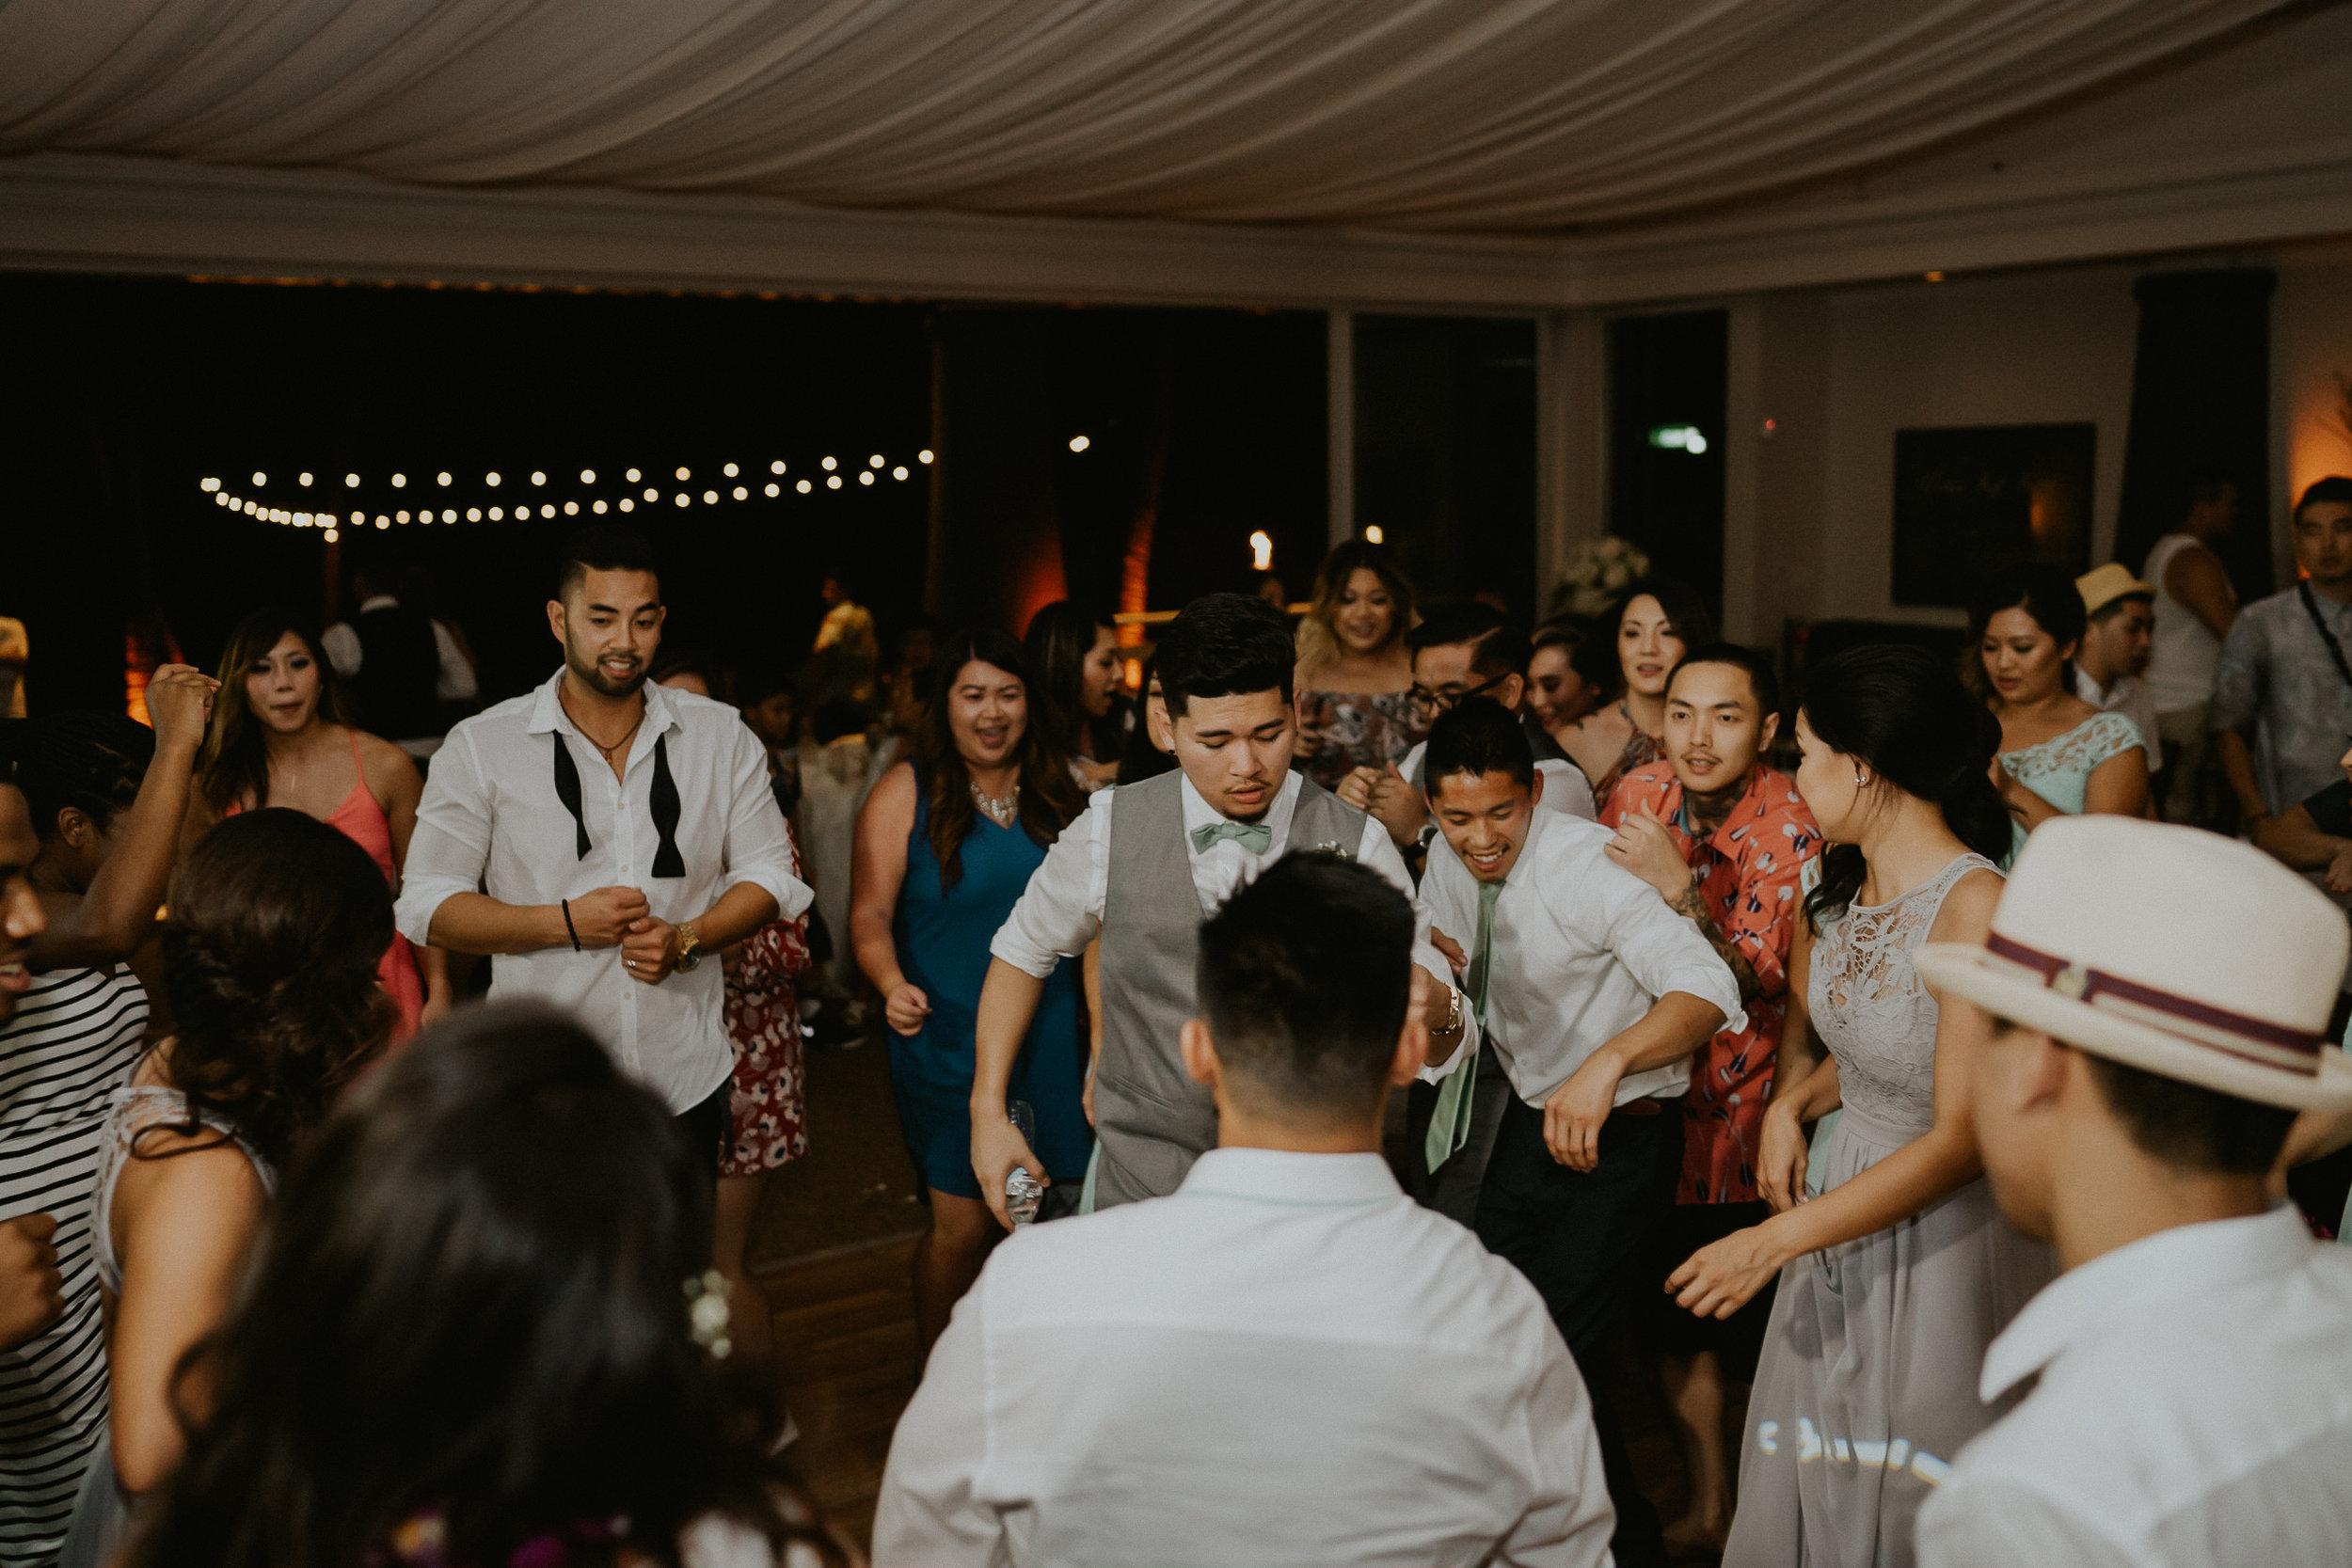 Maui_Destination_wedding_Alfred_Tang-109.jpg